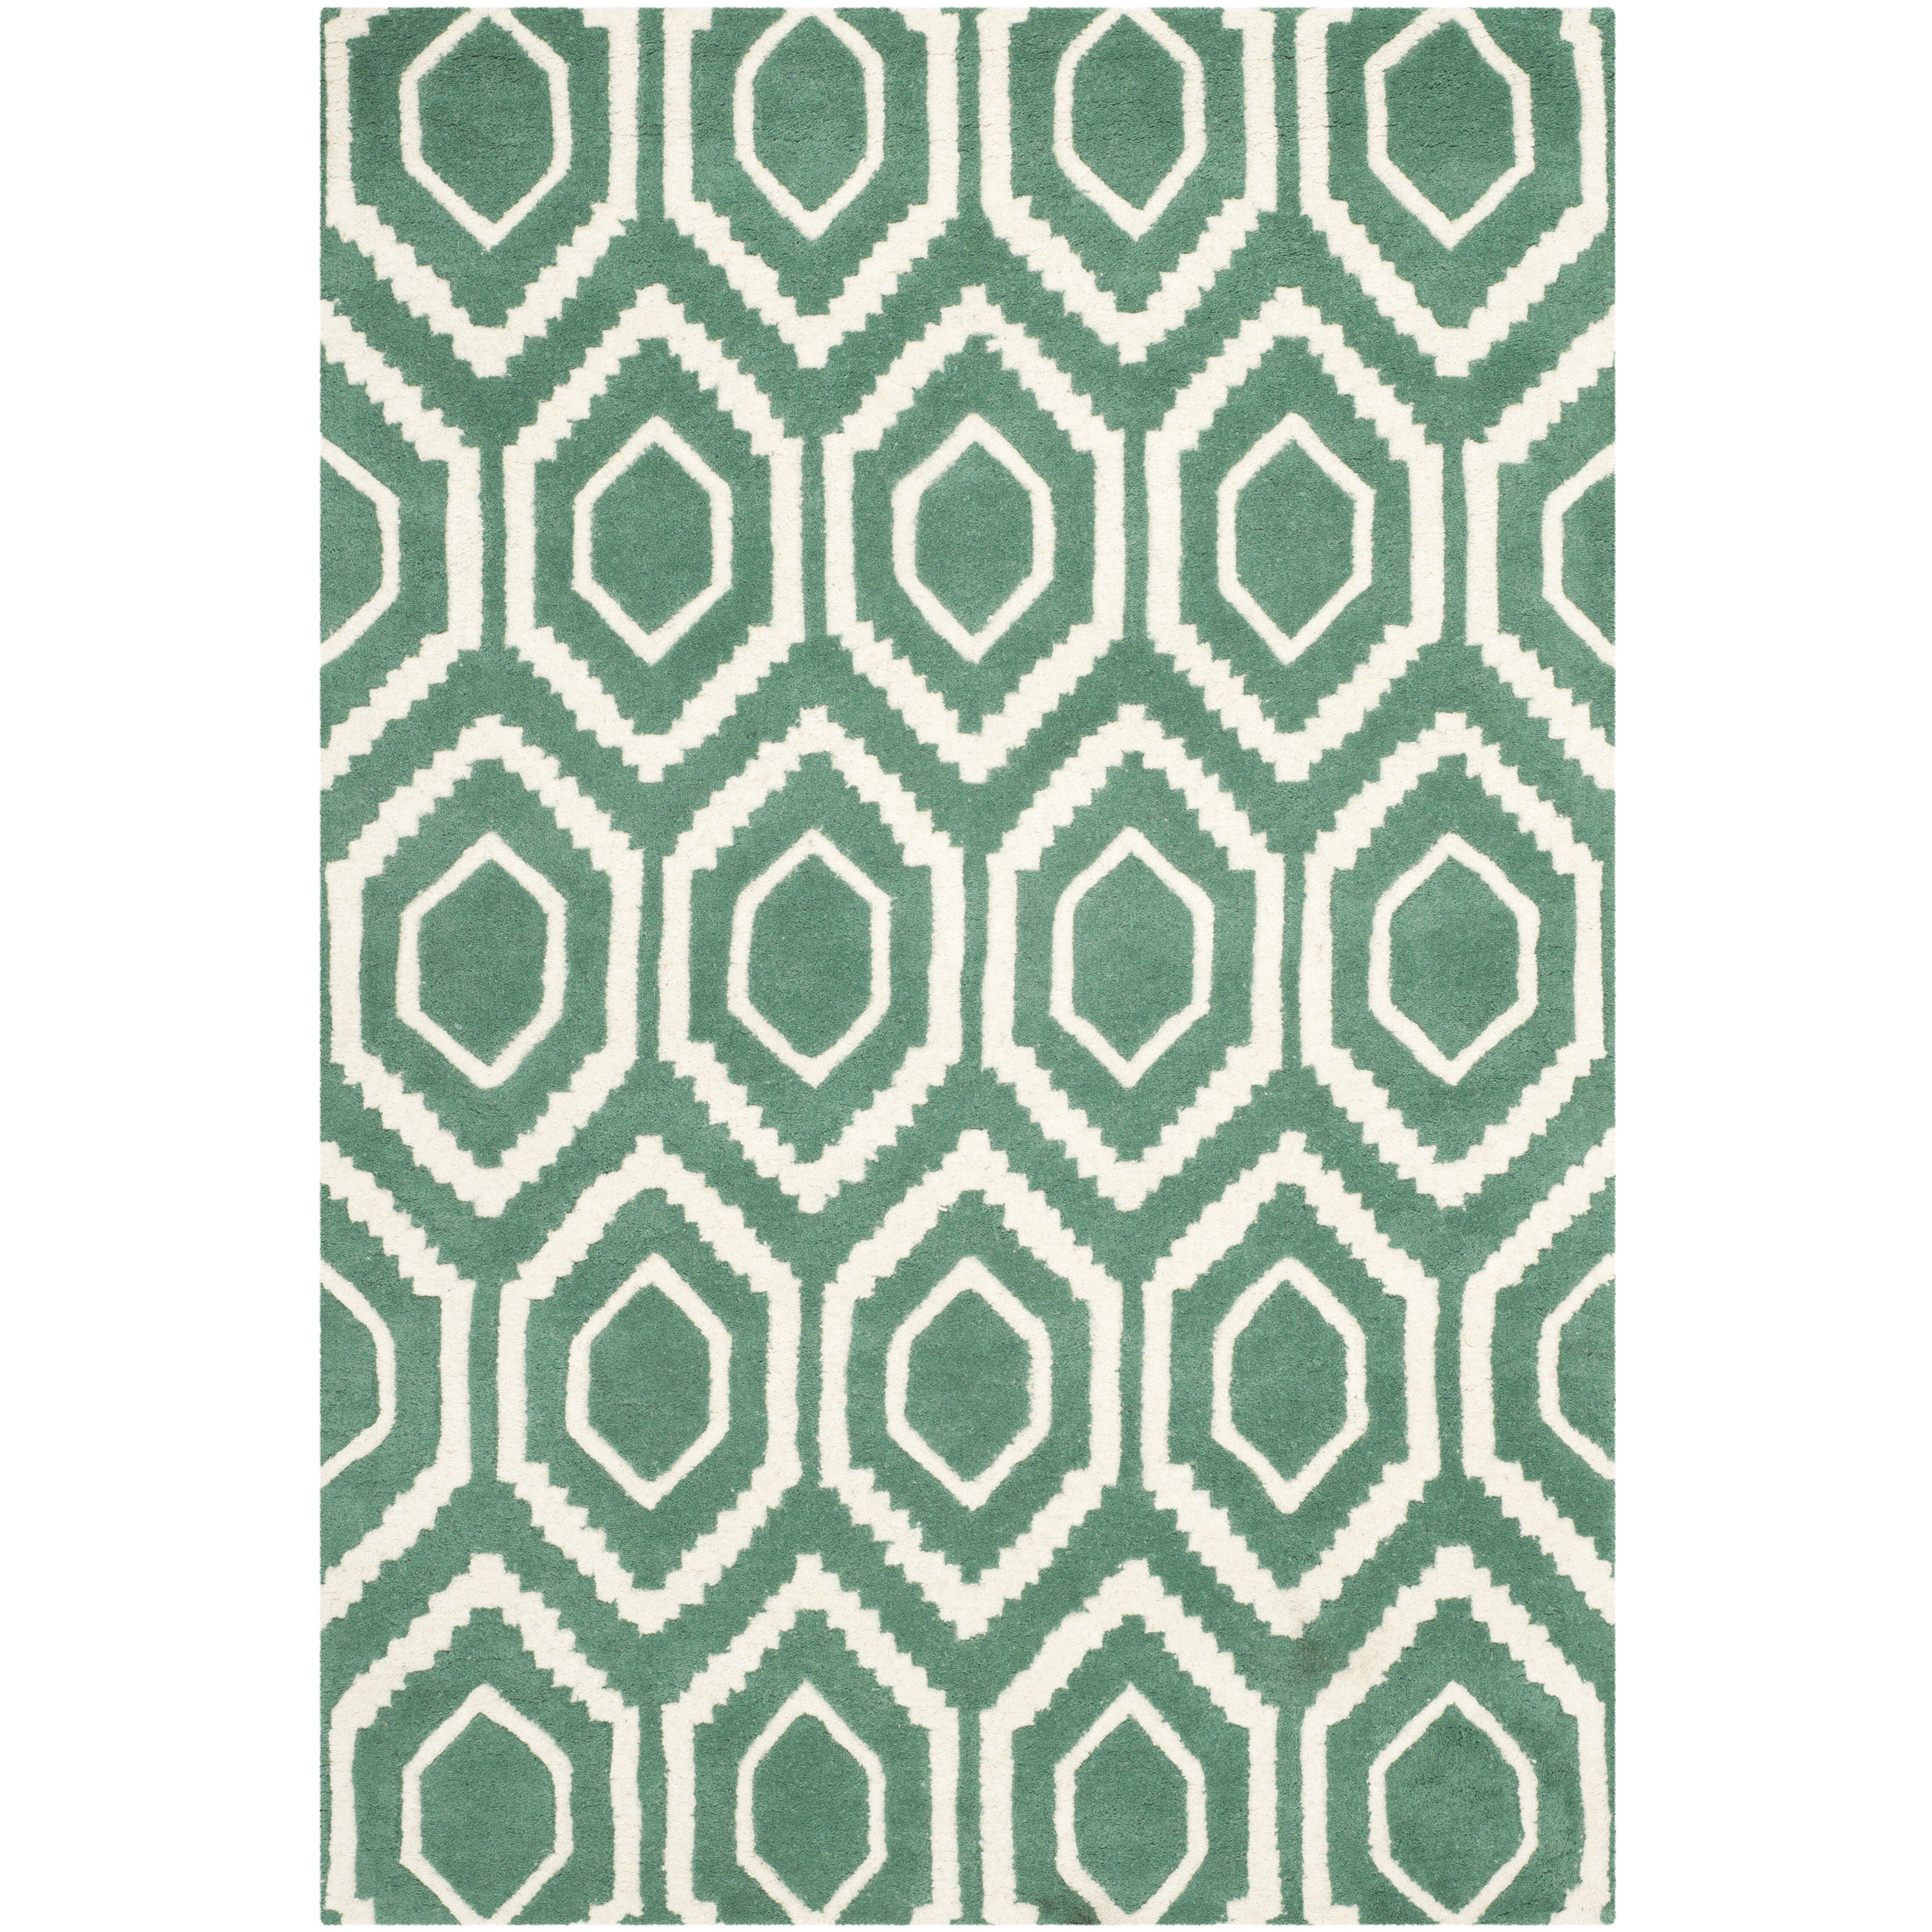 Sydney Hand-Tufted Green Area Rug